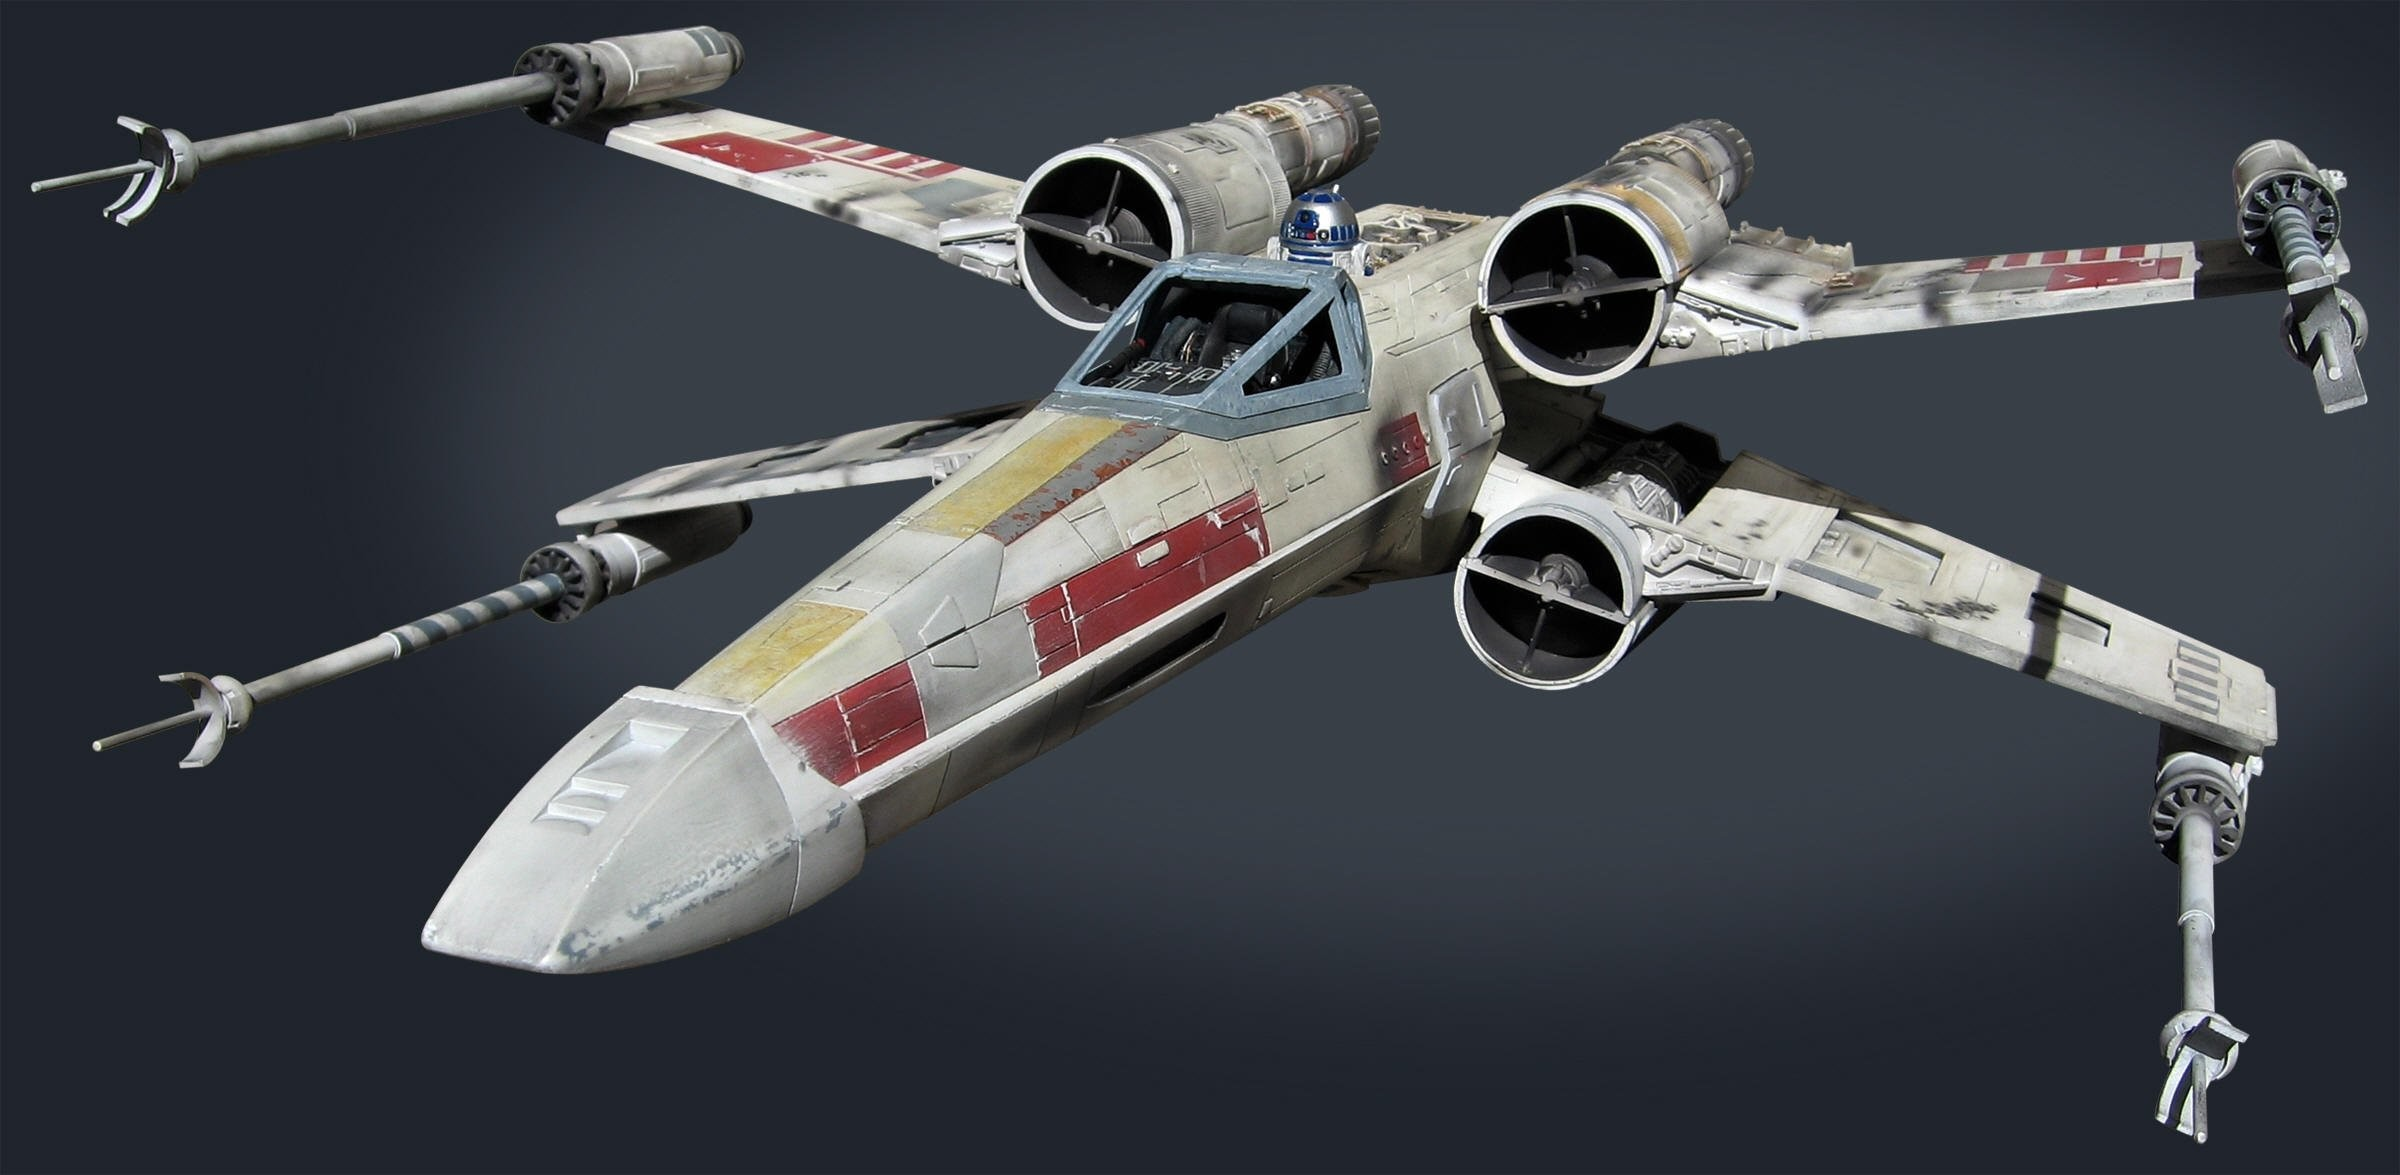 STAR WARS X -WING spaceship futuristic space sci-fi xwing wallpaper |  | 811208 | WallpaperUP